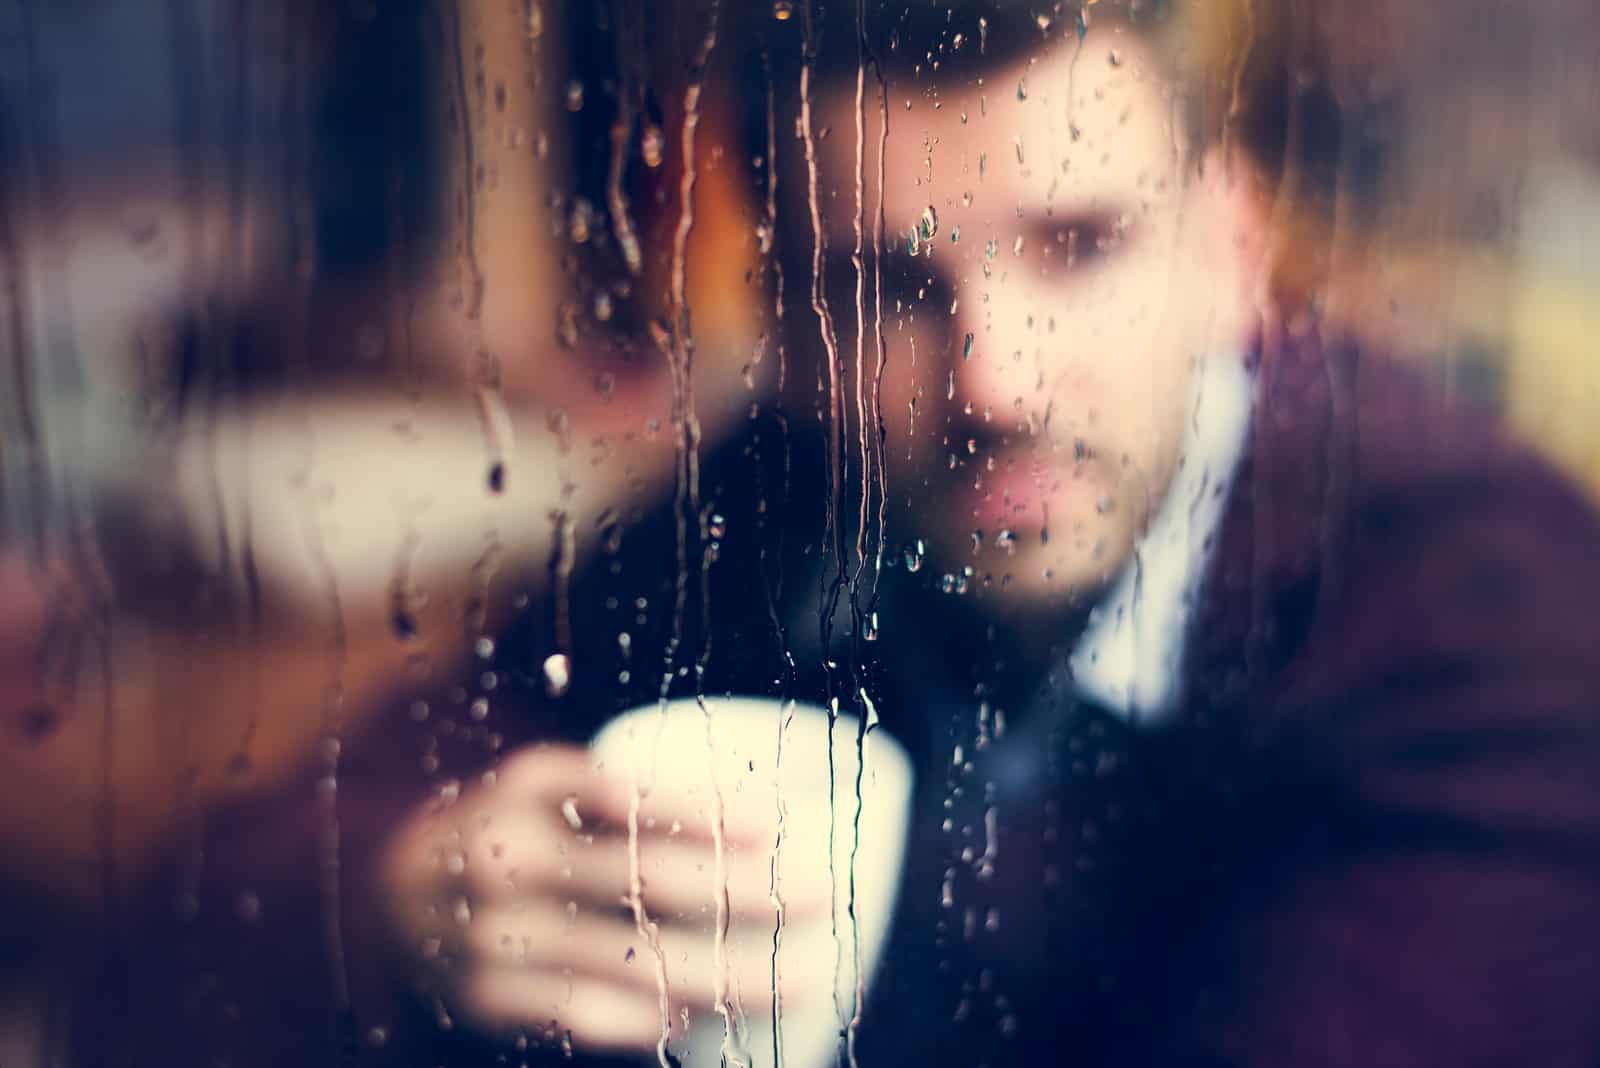 ein imaginärer Mann, der Kaffee trinkt